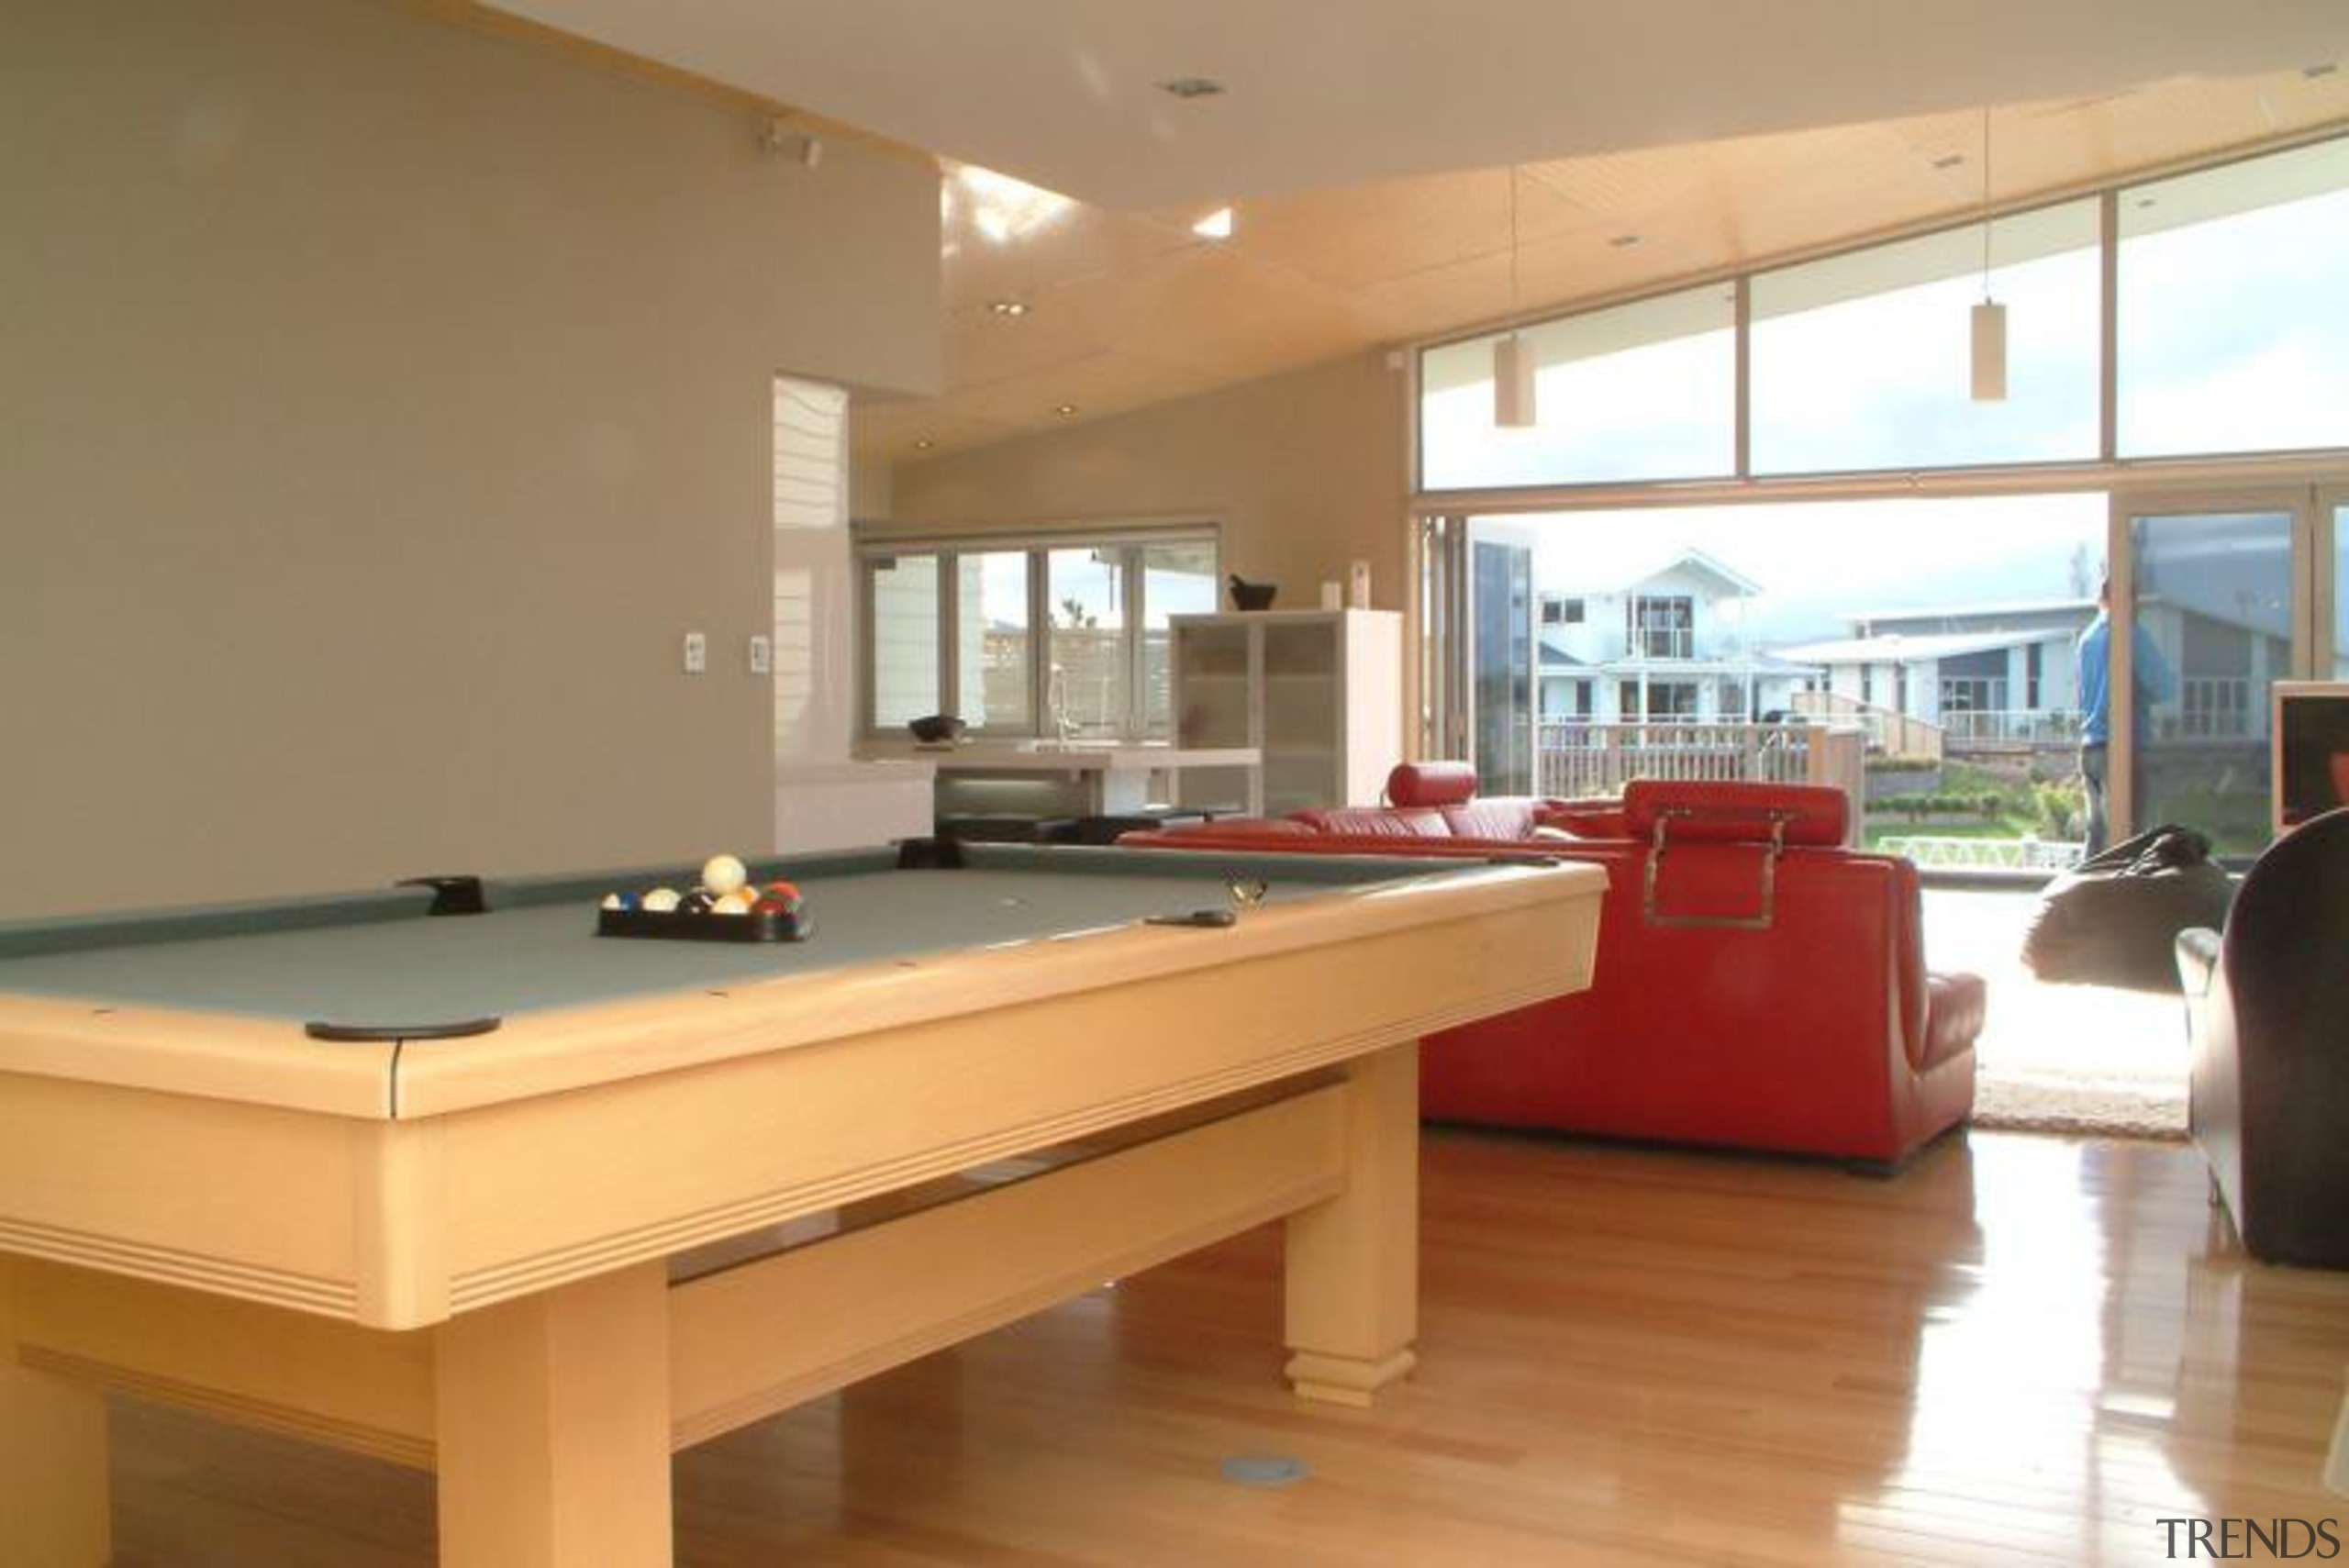 Villaboard Lining - Villaboard Lining 3 - billiard billiard room, billiard table, cue sports, floor, furniture, indoor games and sports, interior design, pool, property, real estate, recreation room, room, table, brown, orange